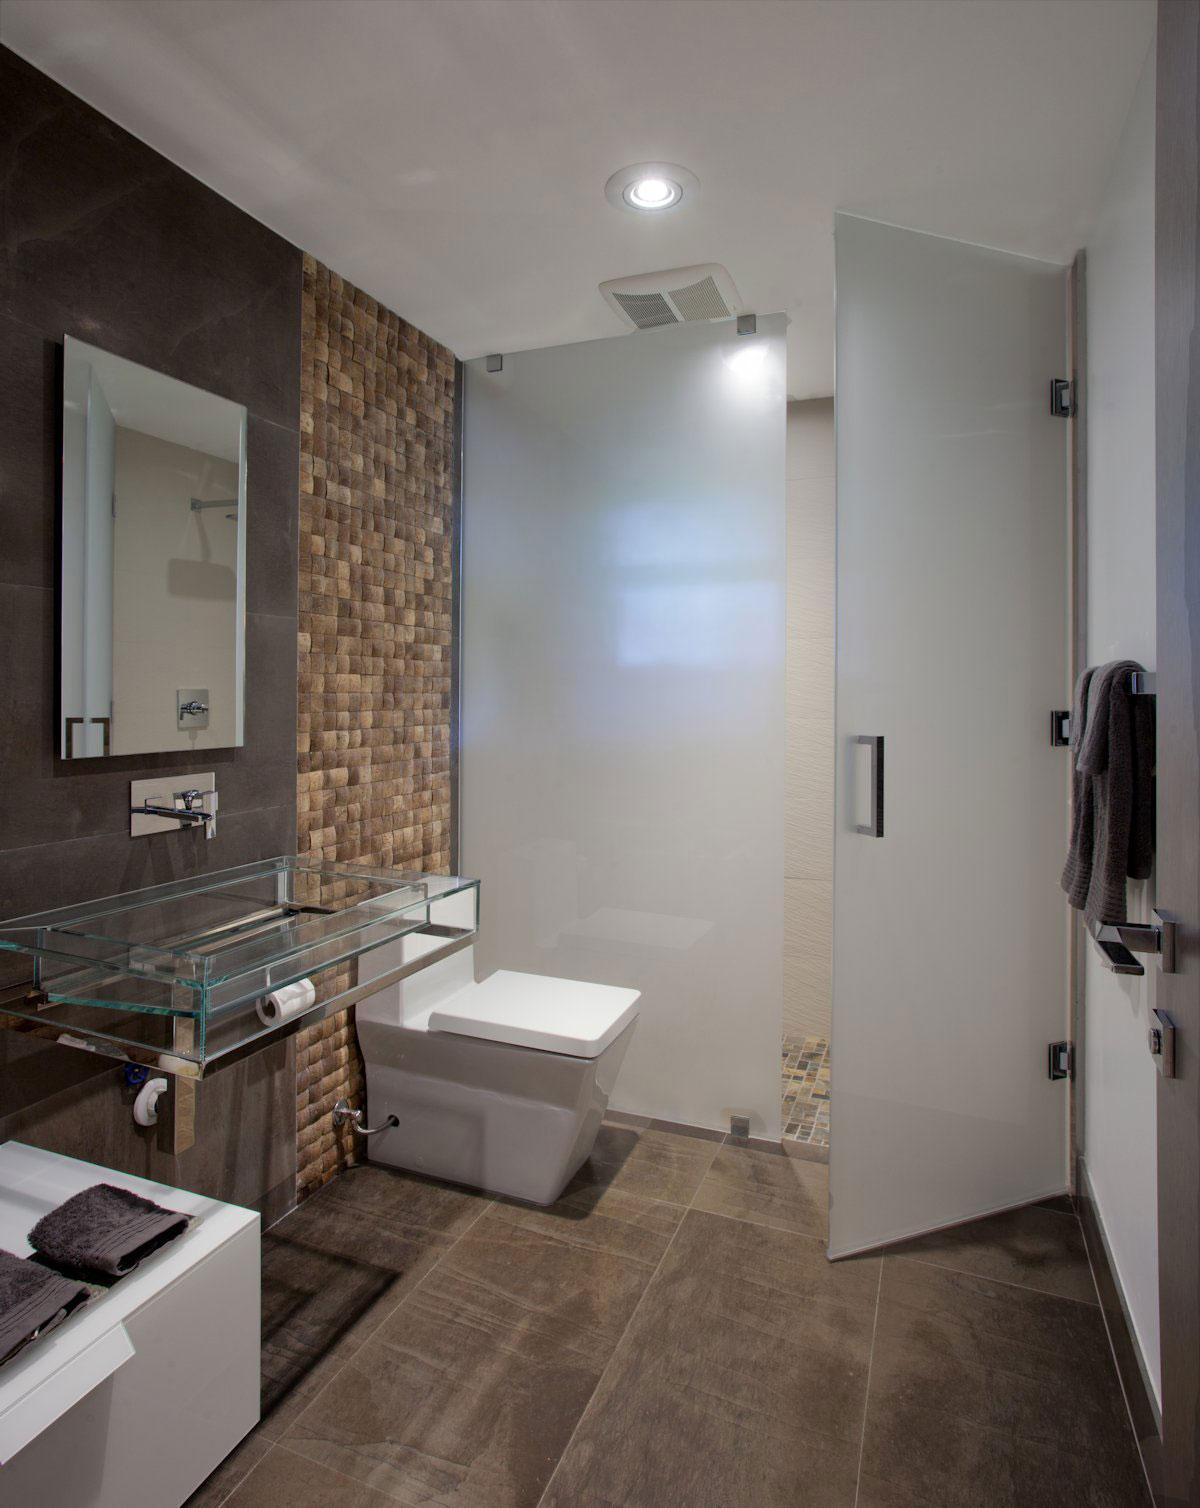 Glass Sink, Smoked Glass Shower Screen & Door, Modern Retreat in Davie, Florida